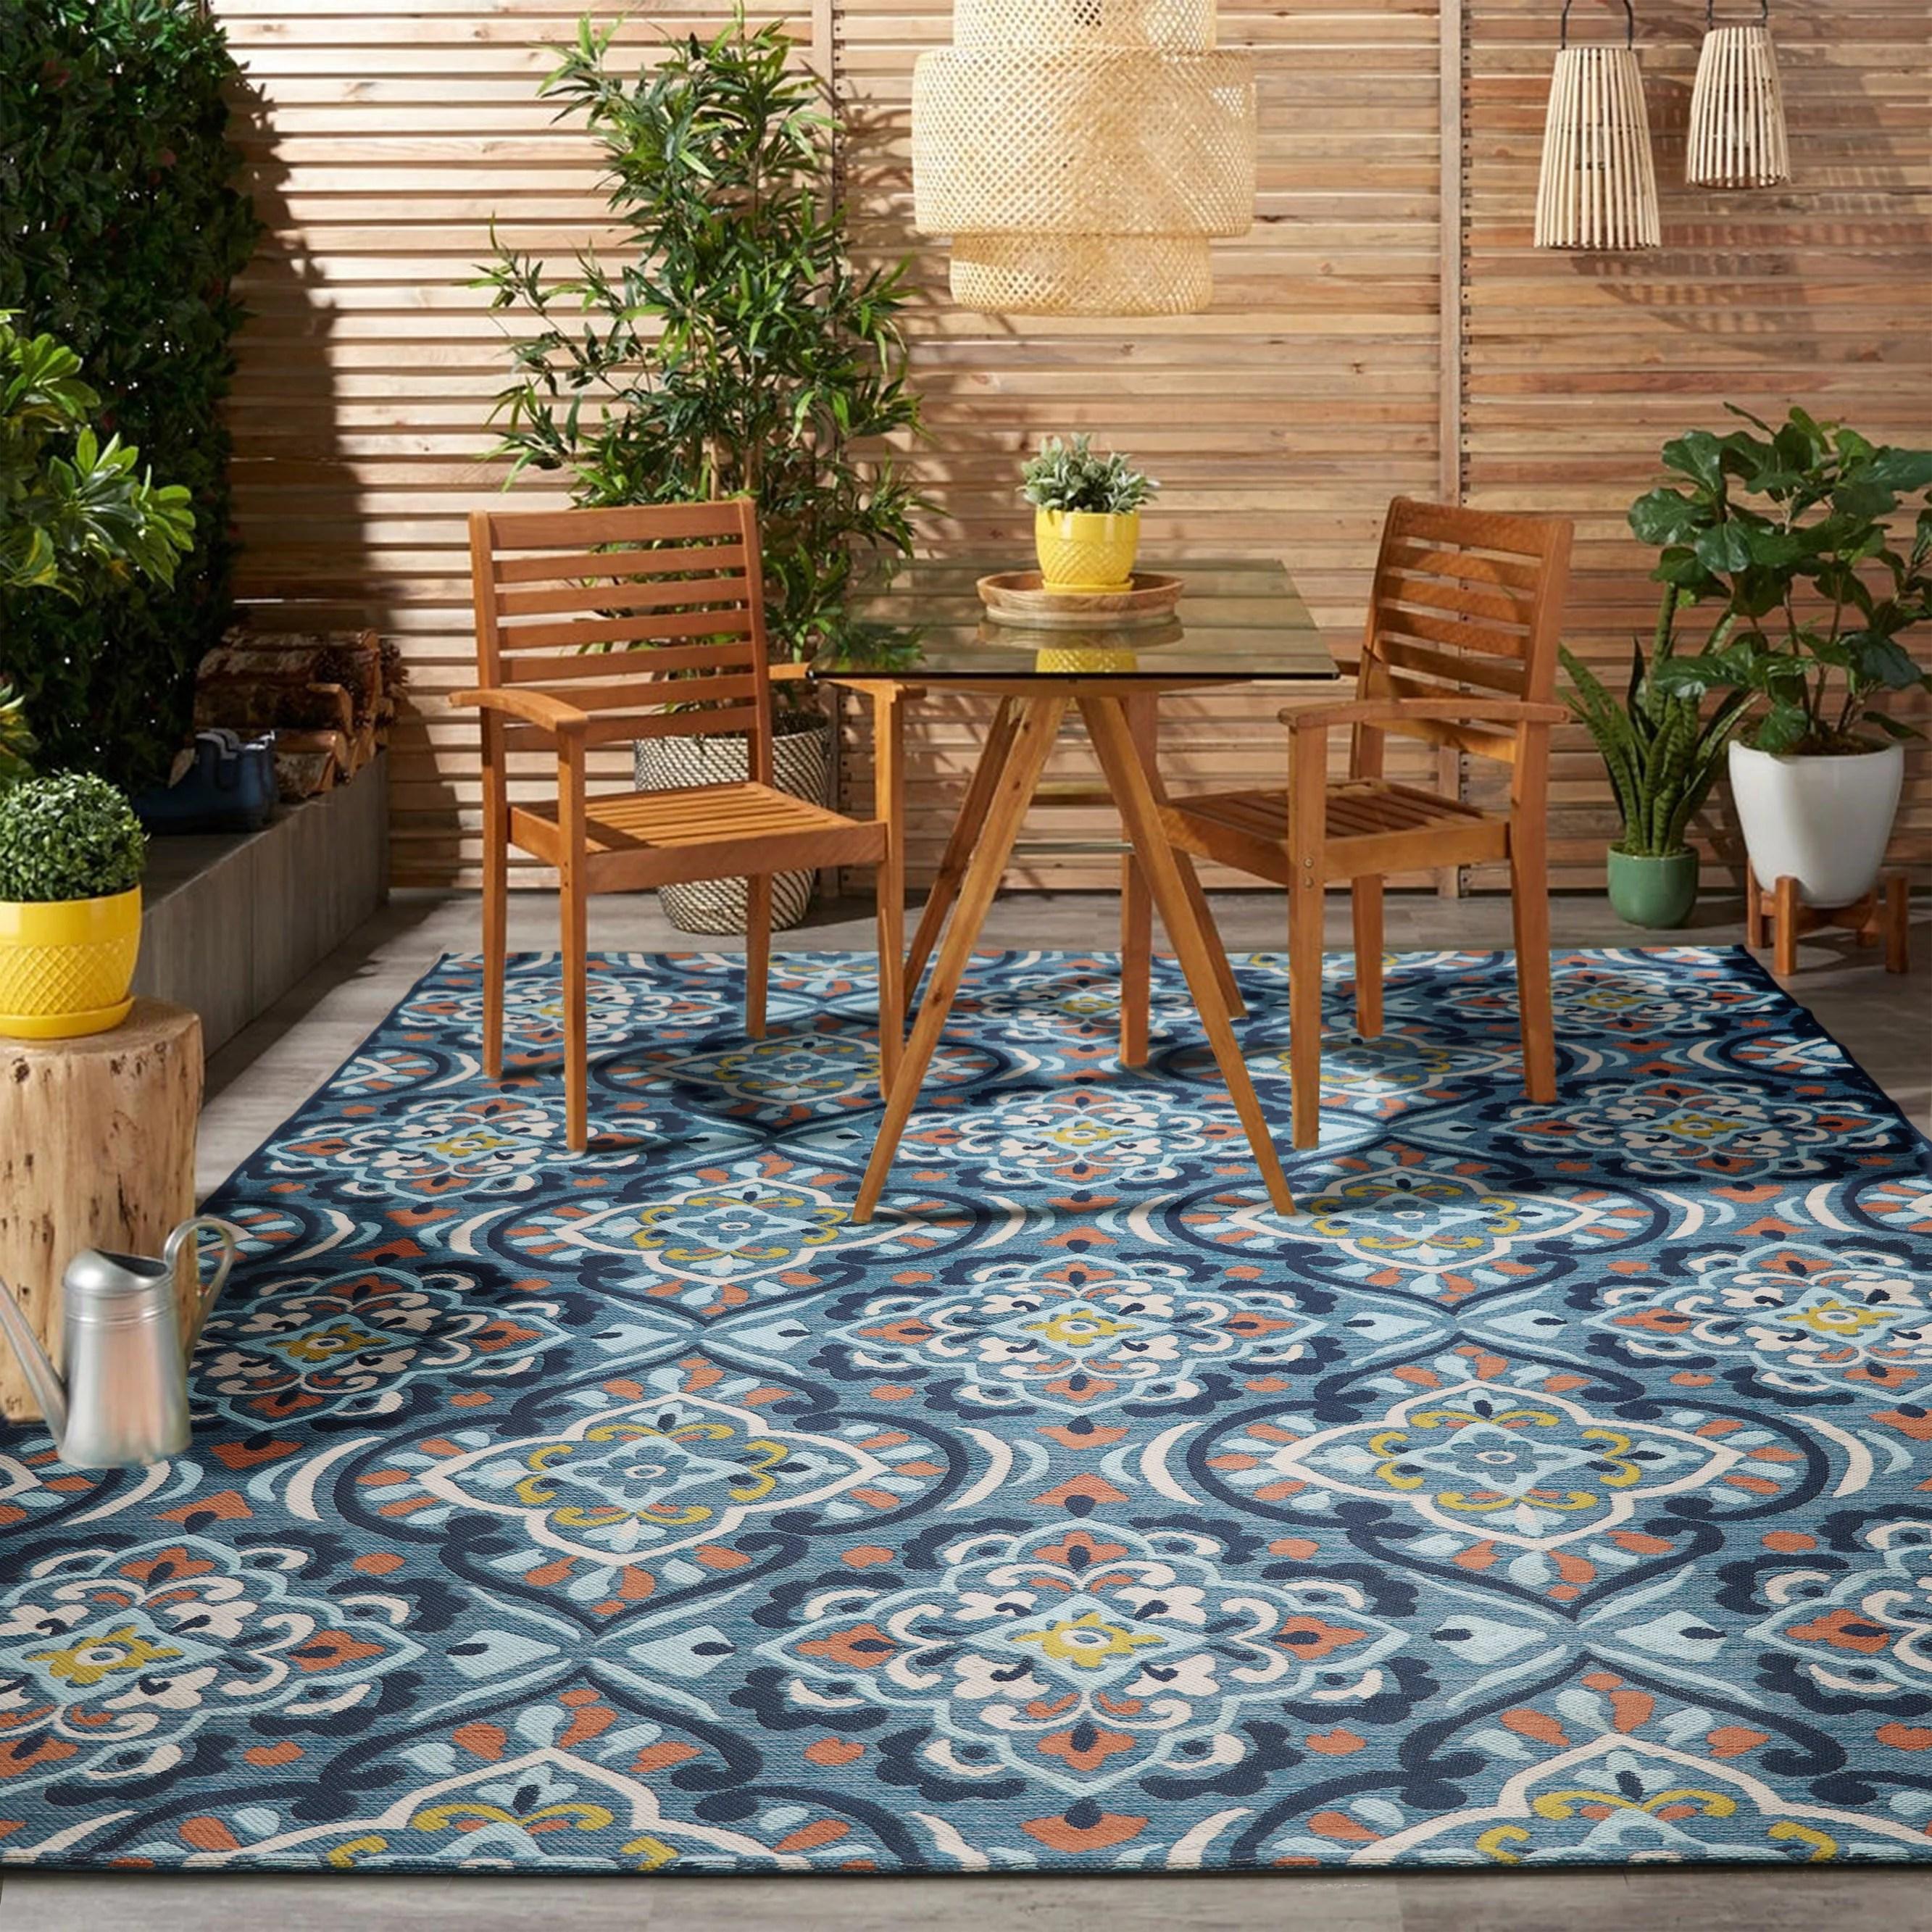 better homes gardens turquoise medallion outdoor rug 7x10